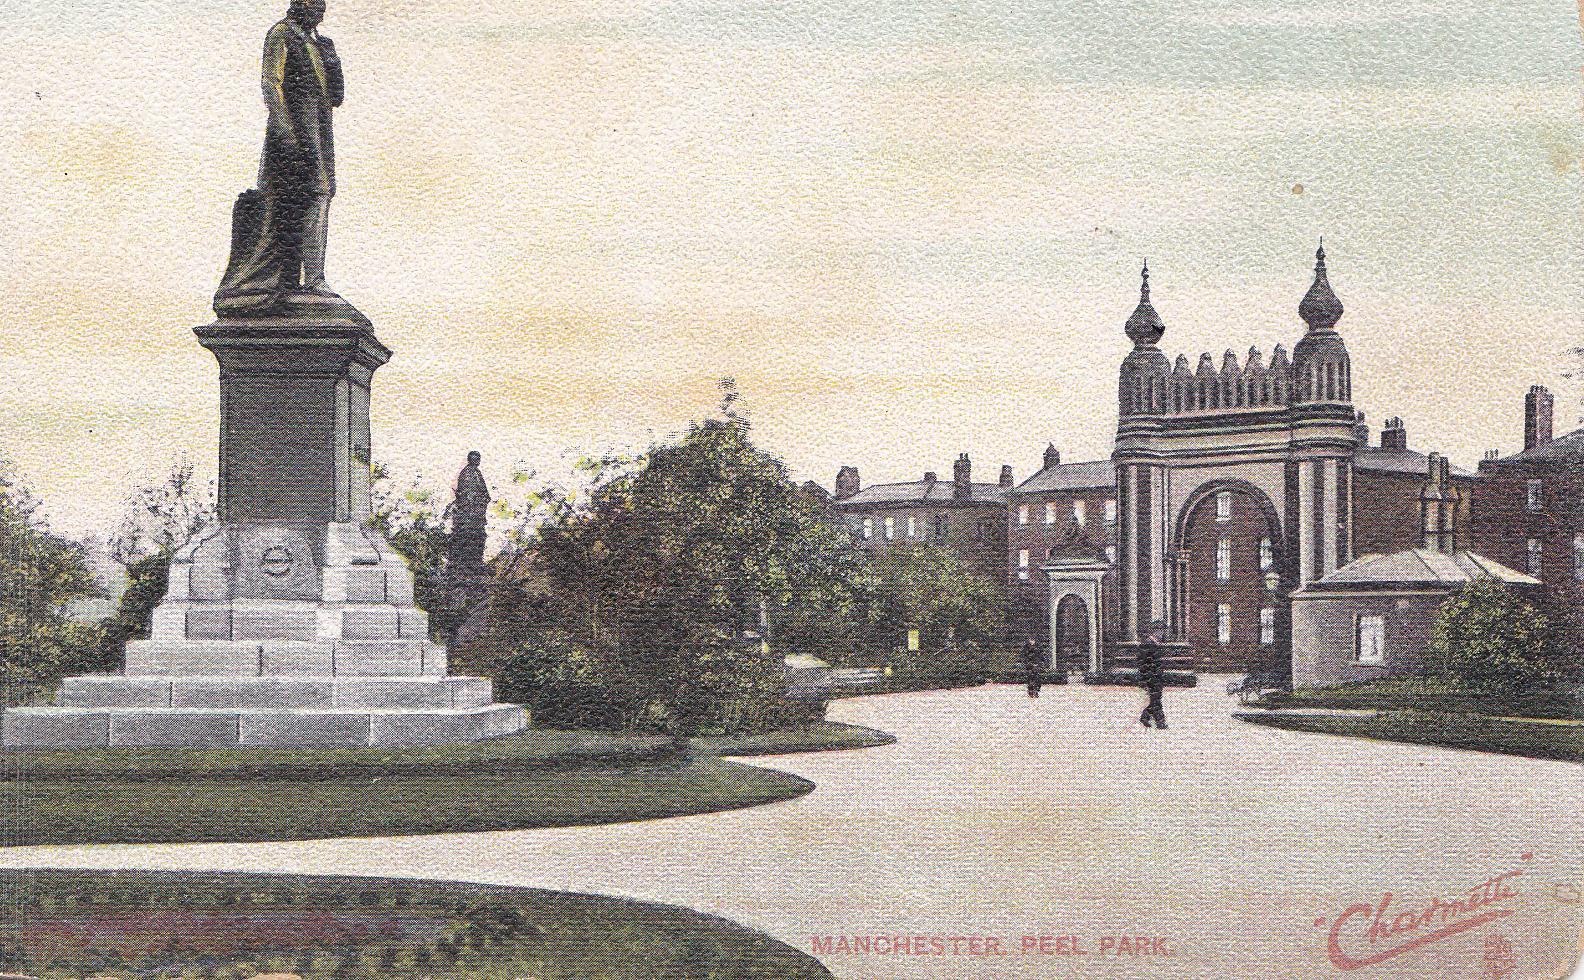 Postcard from Peel Park